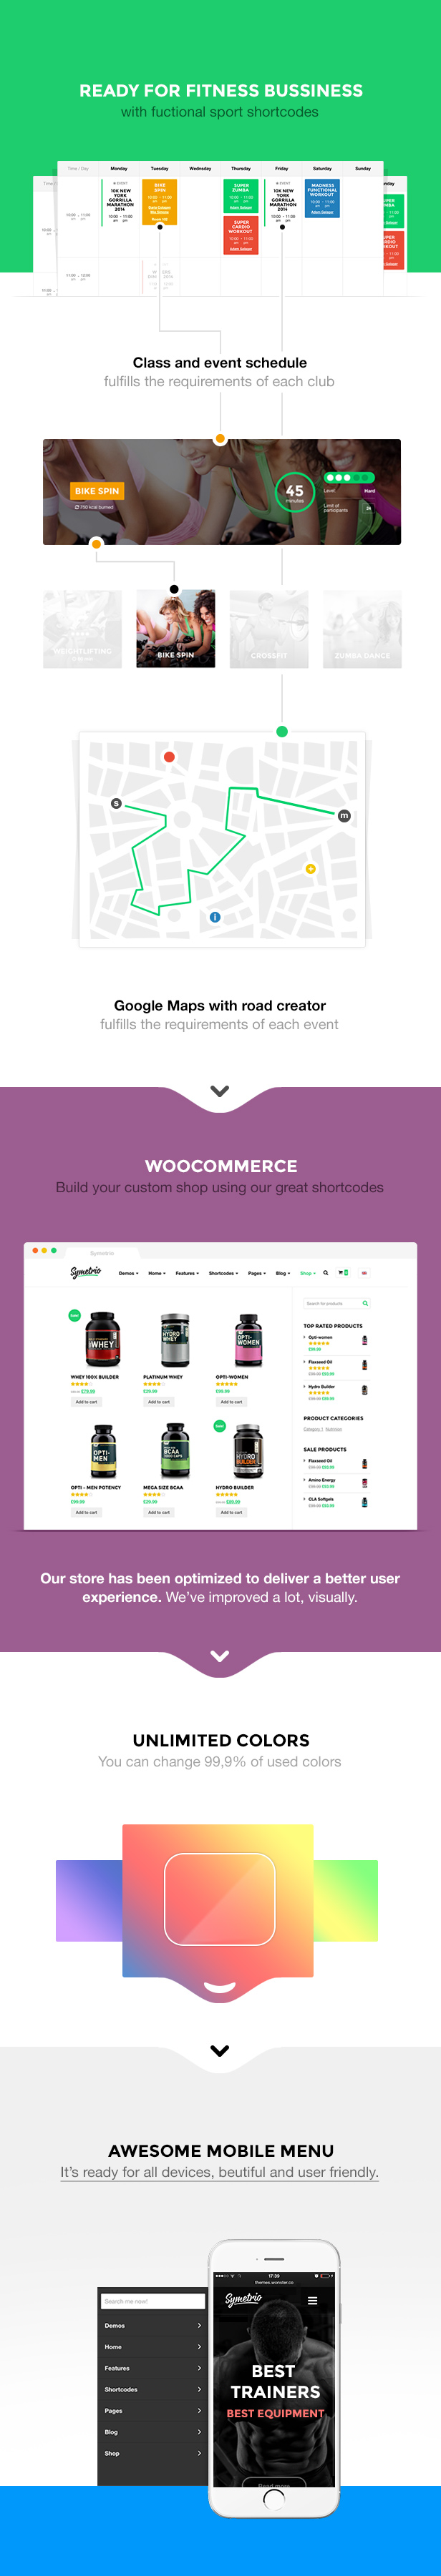 Symetrio - Gym & Fitness WordPress Theme - 3